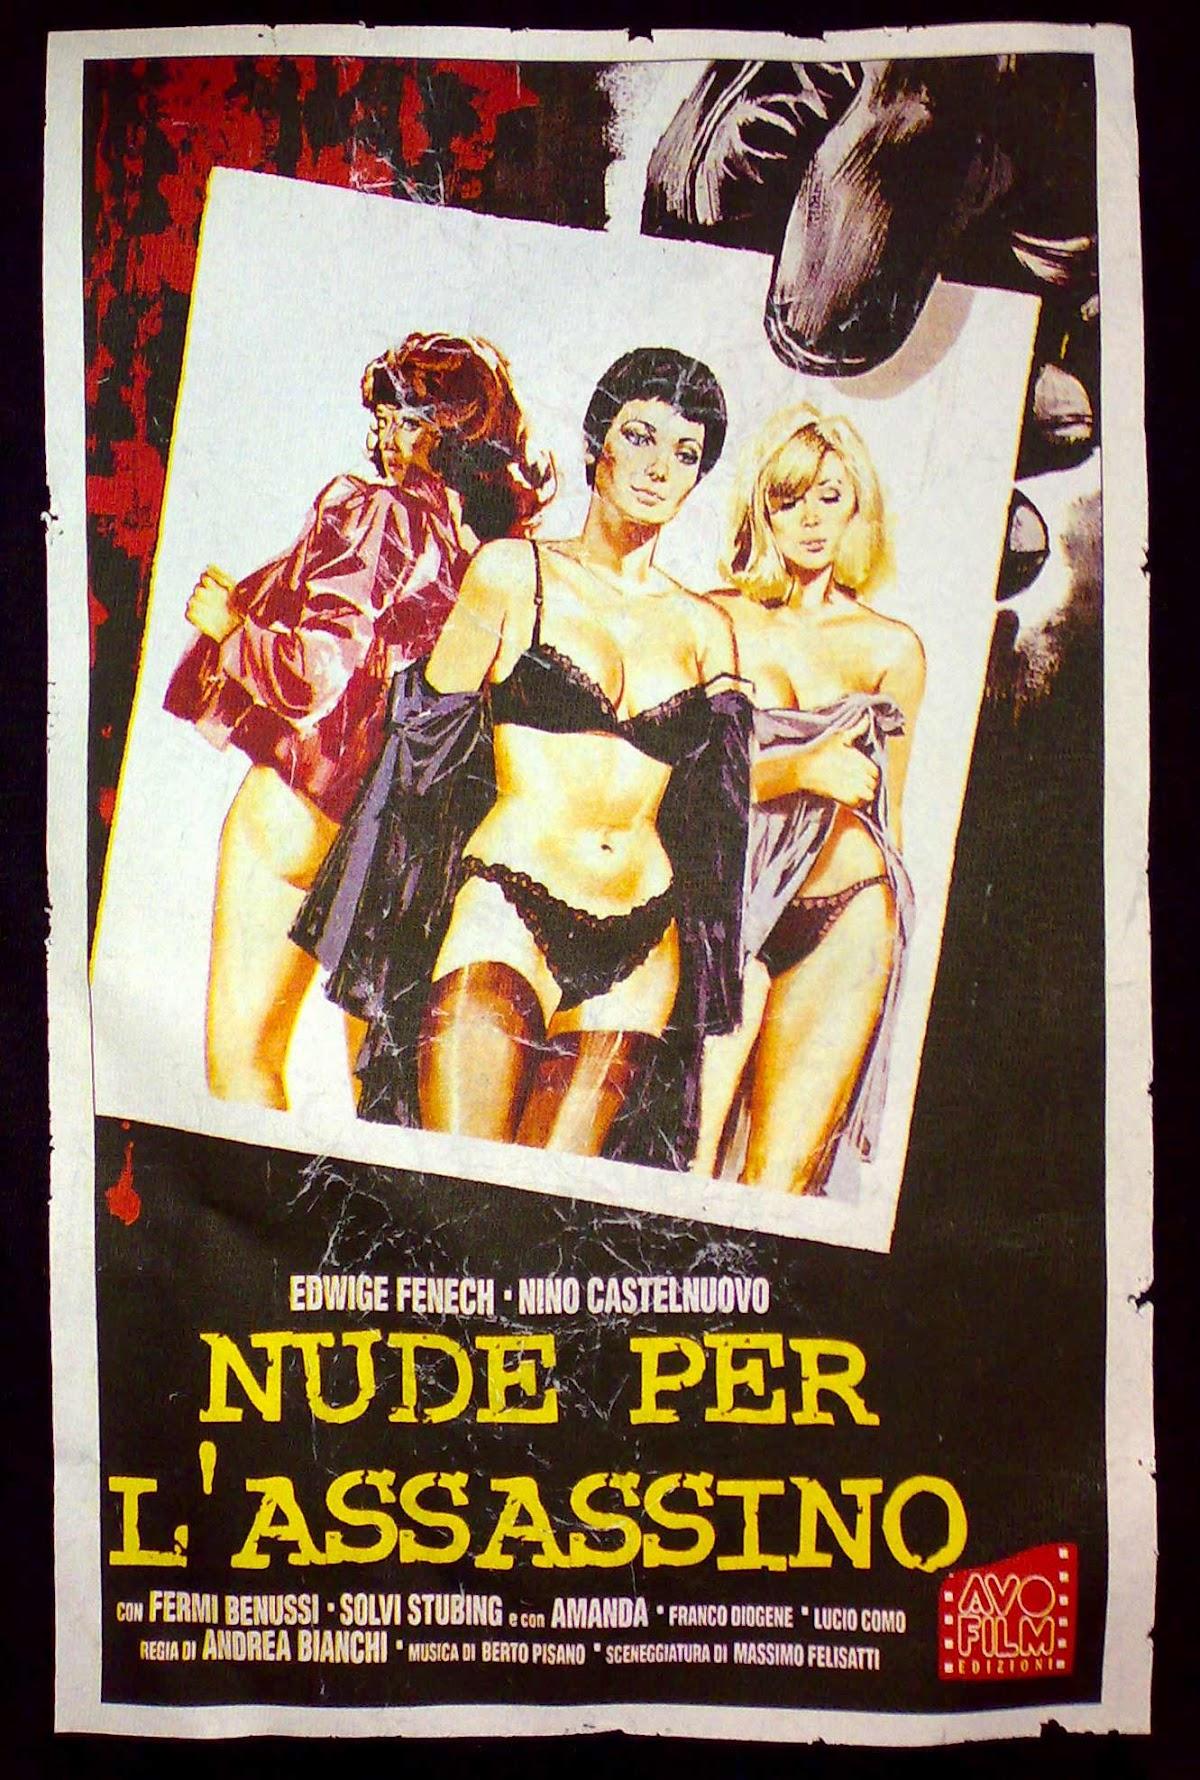 http://2.bp.blogspot.com/-ySFtVMrMnfQ/UNfSIKHio7I/AAAAAAAAHew/9_MvnIR0NCU/s1780/strip-nude-killer.jpg